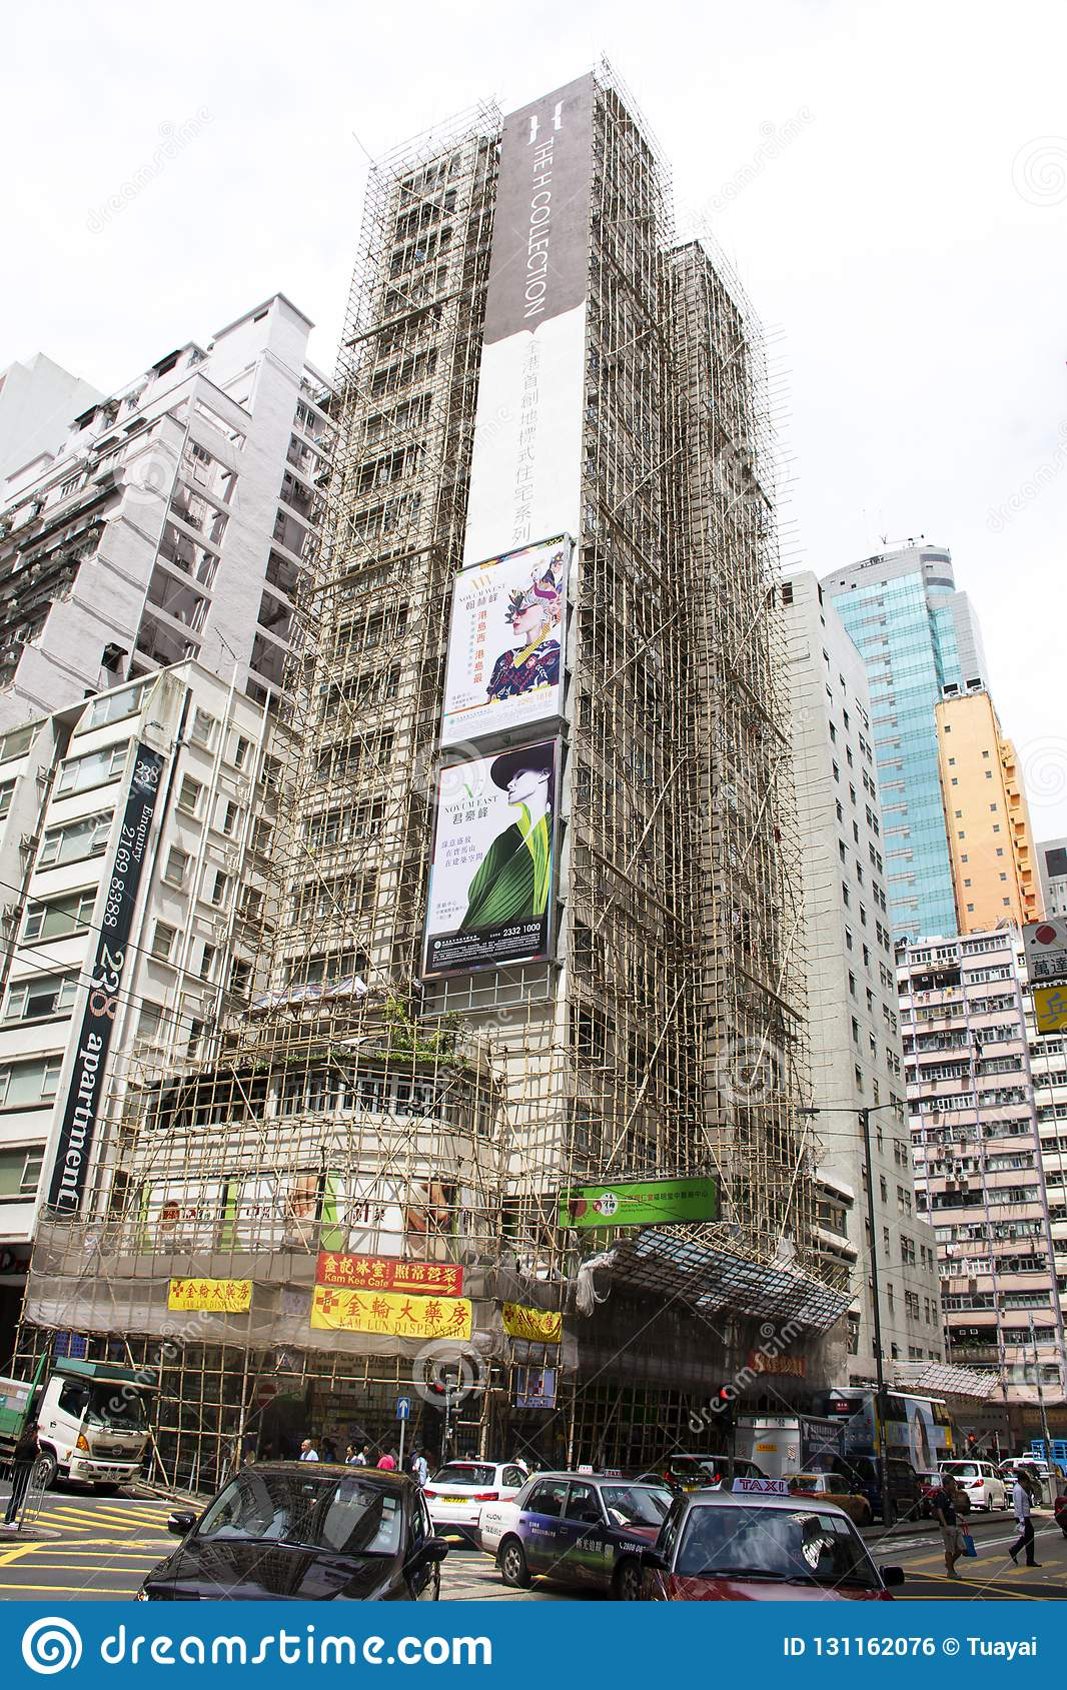 Verkehrsstraße und Gebäude in der Baustelle neben Fa Yuen Street bei Mongkok in Hong Kong, China erneuern